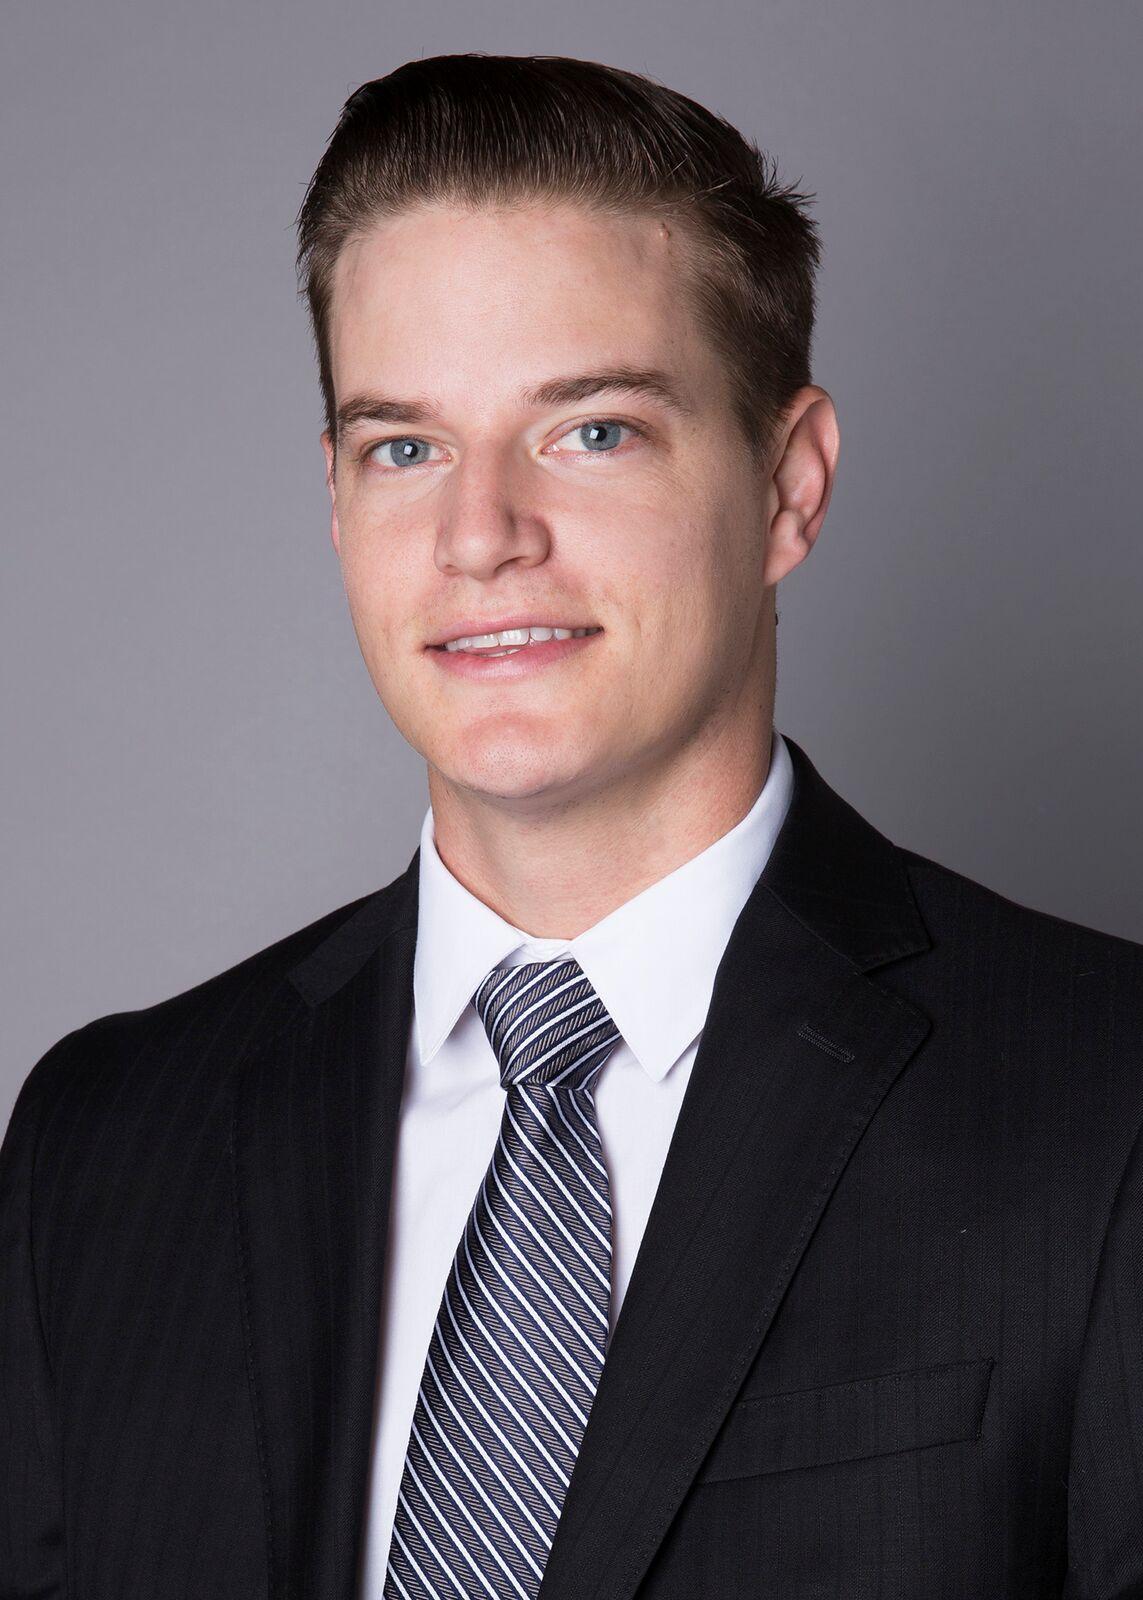 Professional Photo of Stephen Brady